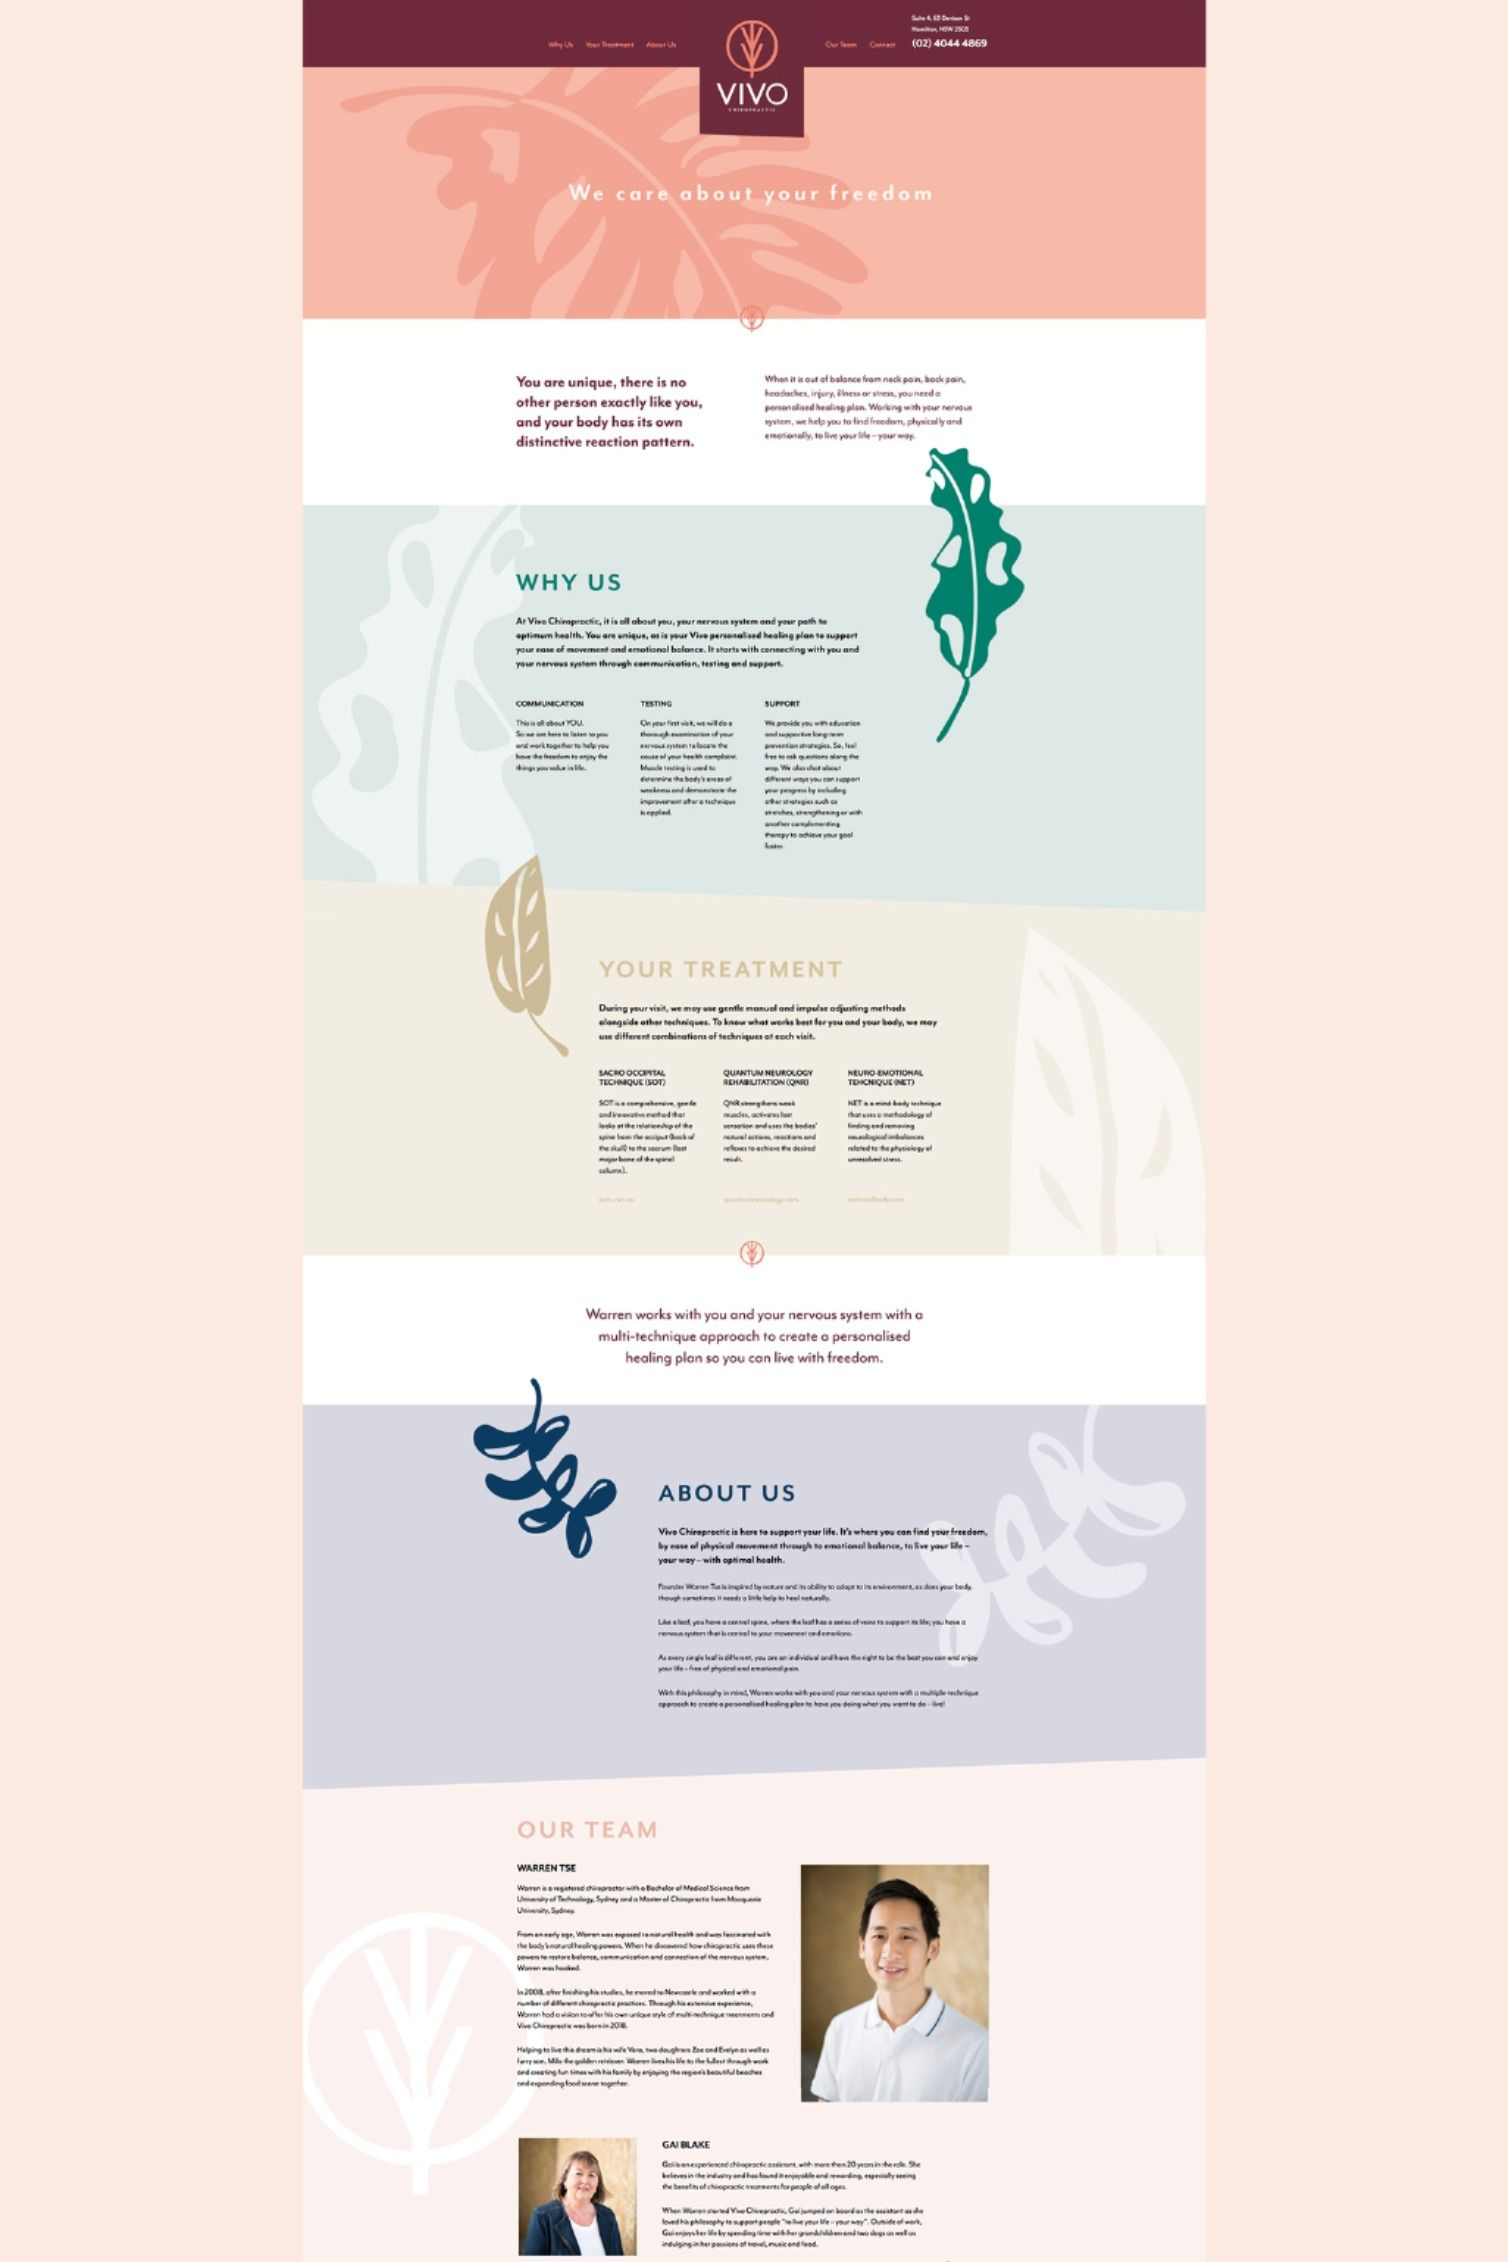 Vivo Chiropractic In 2020 Web Design Web Design Inspiration Creative Design